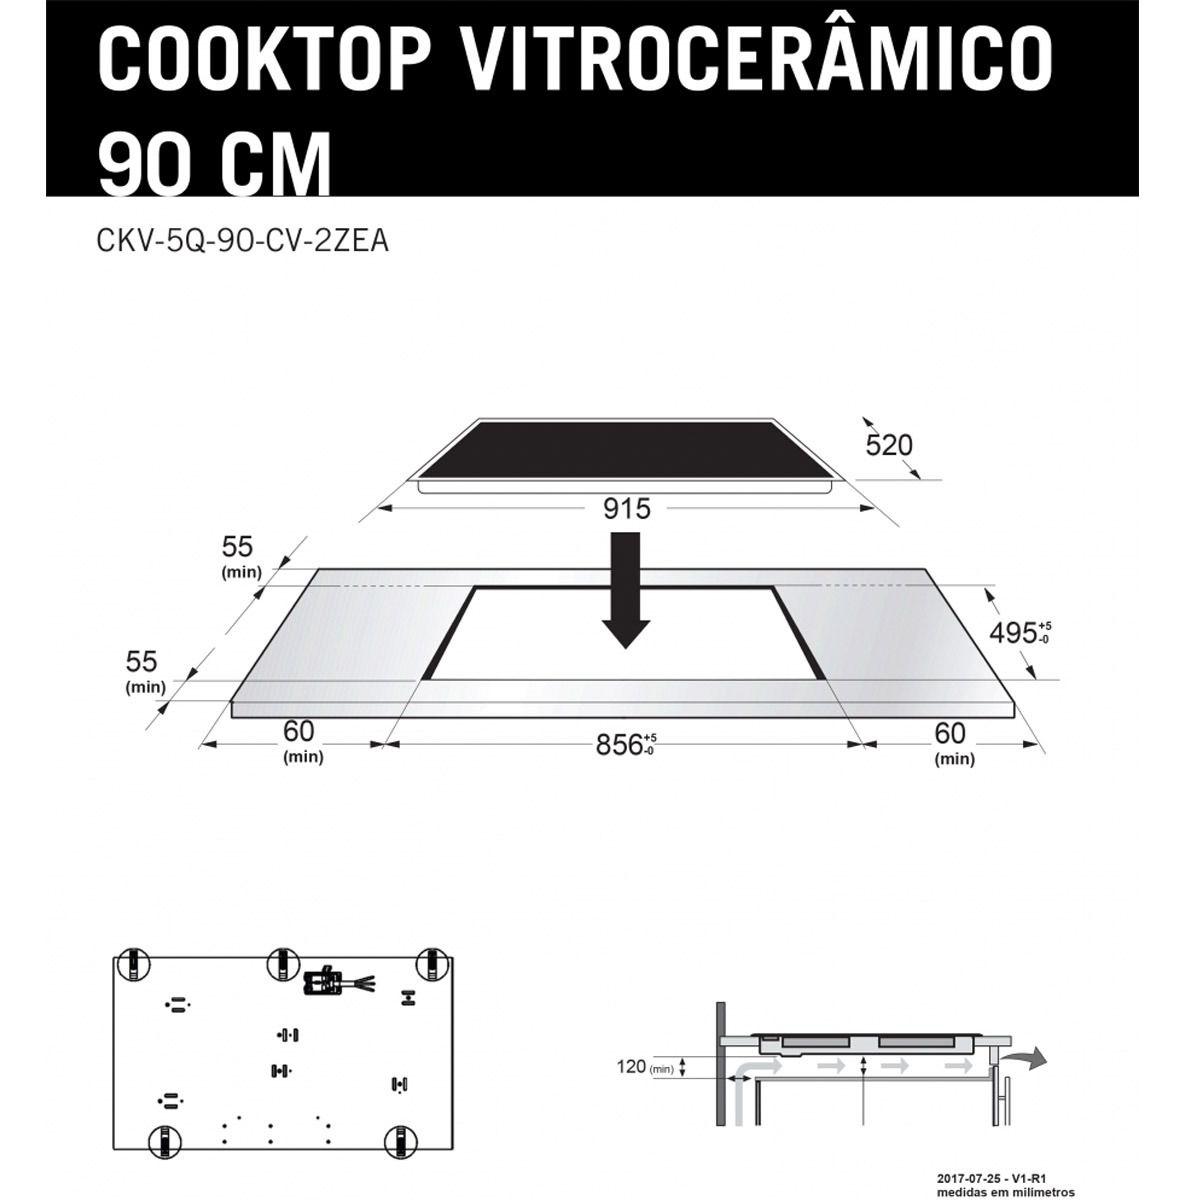 Cooktop Elétrico 5 Queimadores Vitrocerâmico Elettromec 90cm 220V